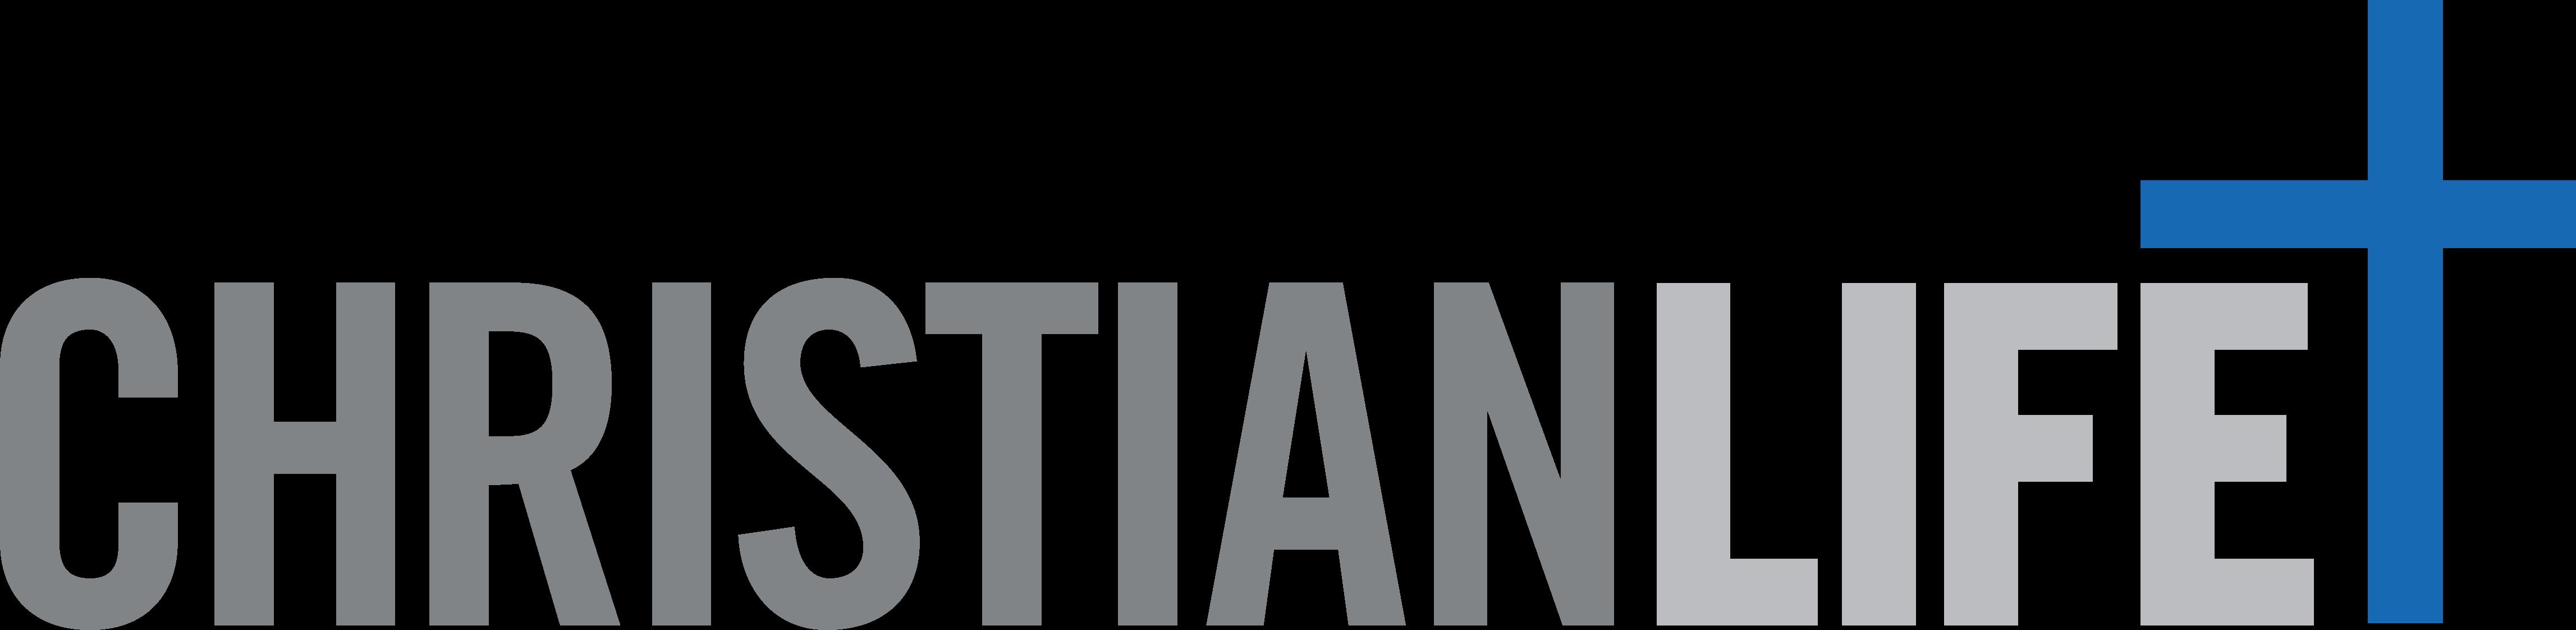 Christian Life College